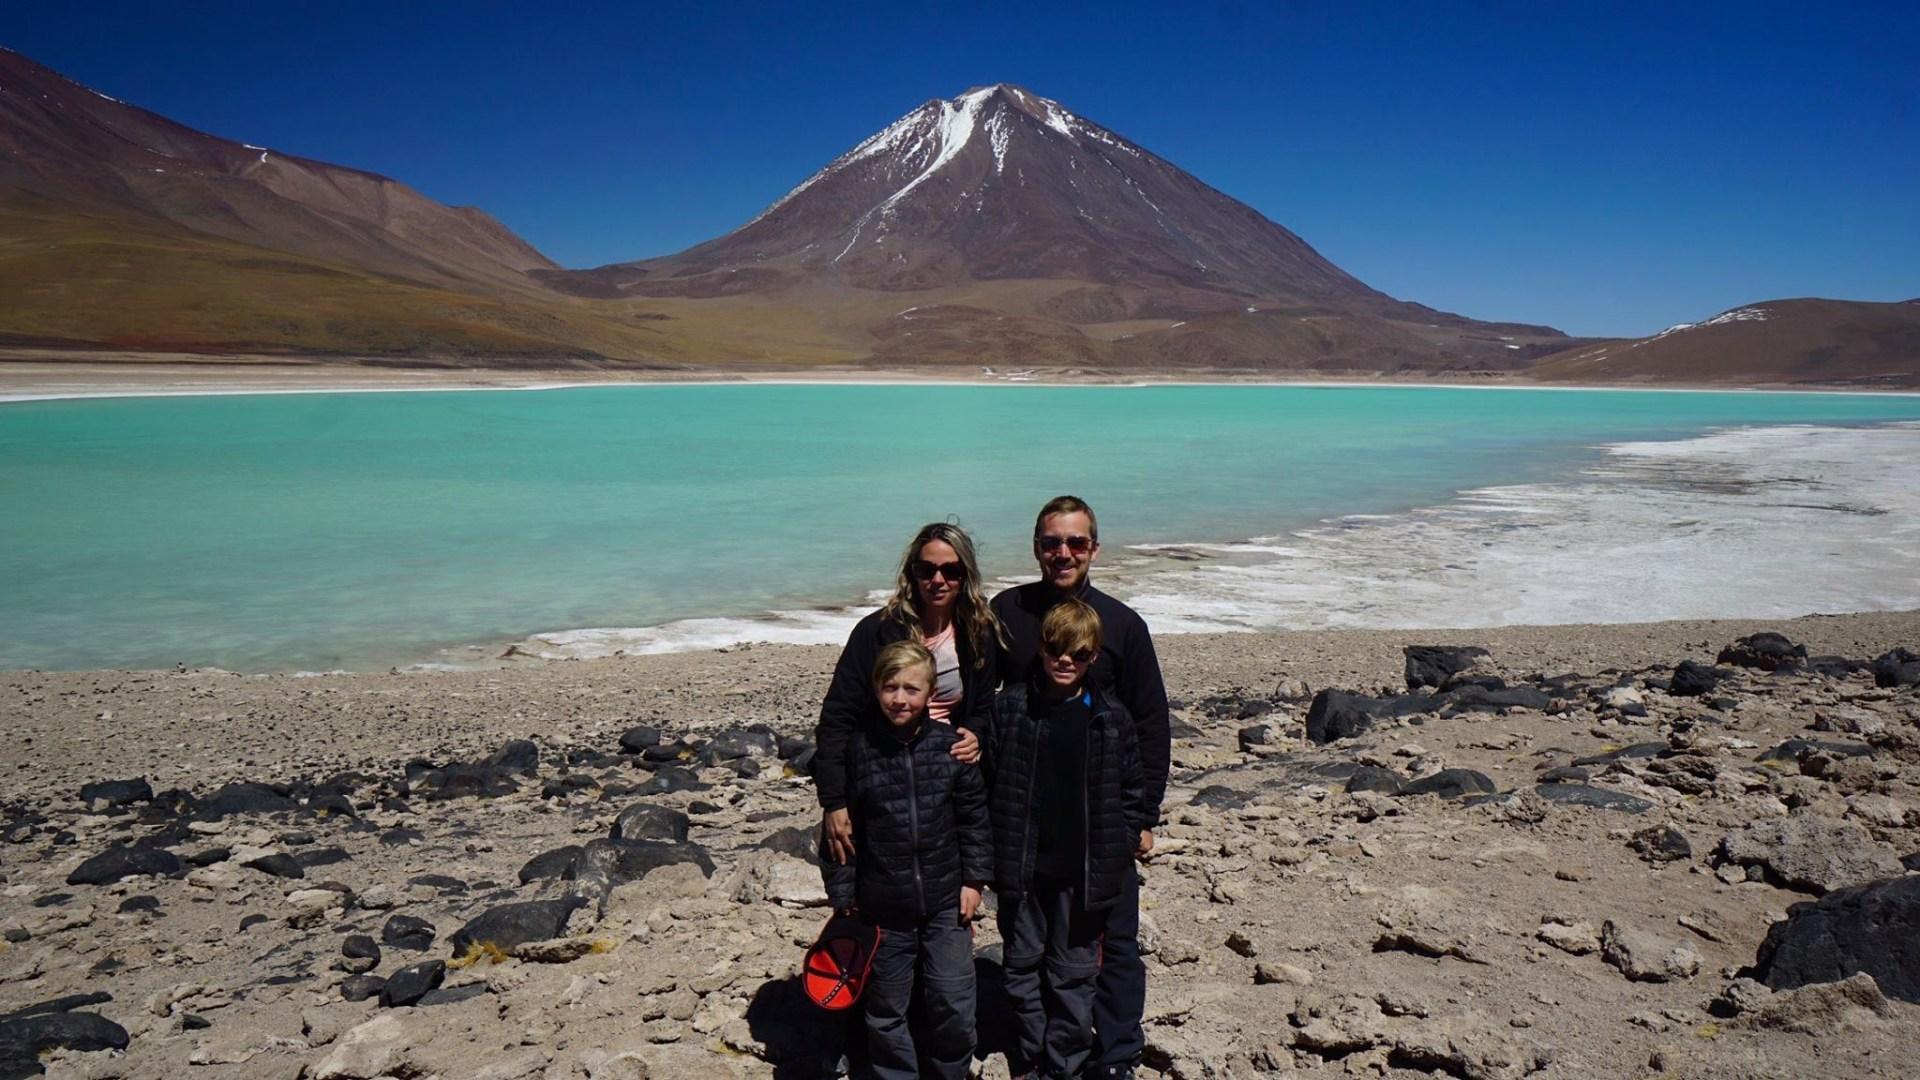 Bolivie - L'heure du bilan